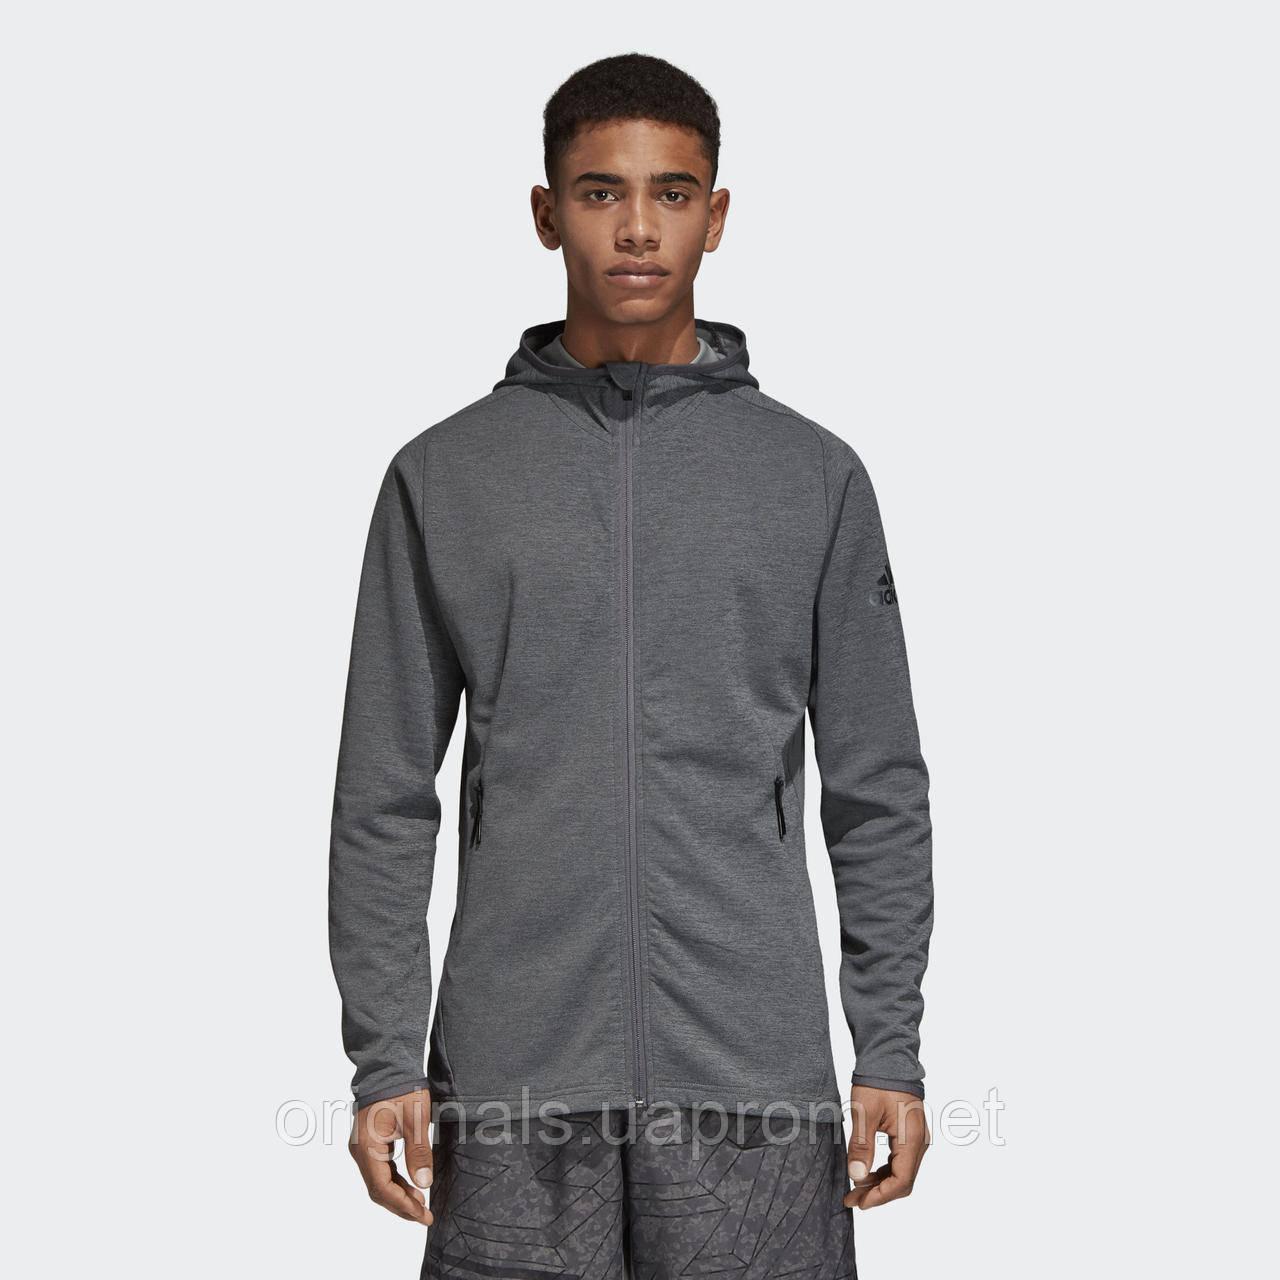 Толстовка мужская Adidas FreeLift Climacool DN1860